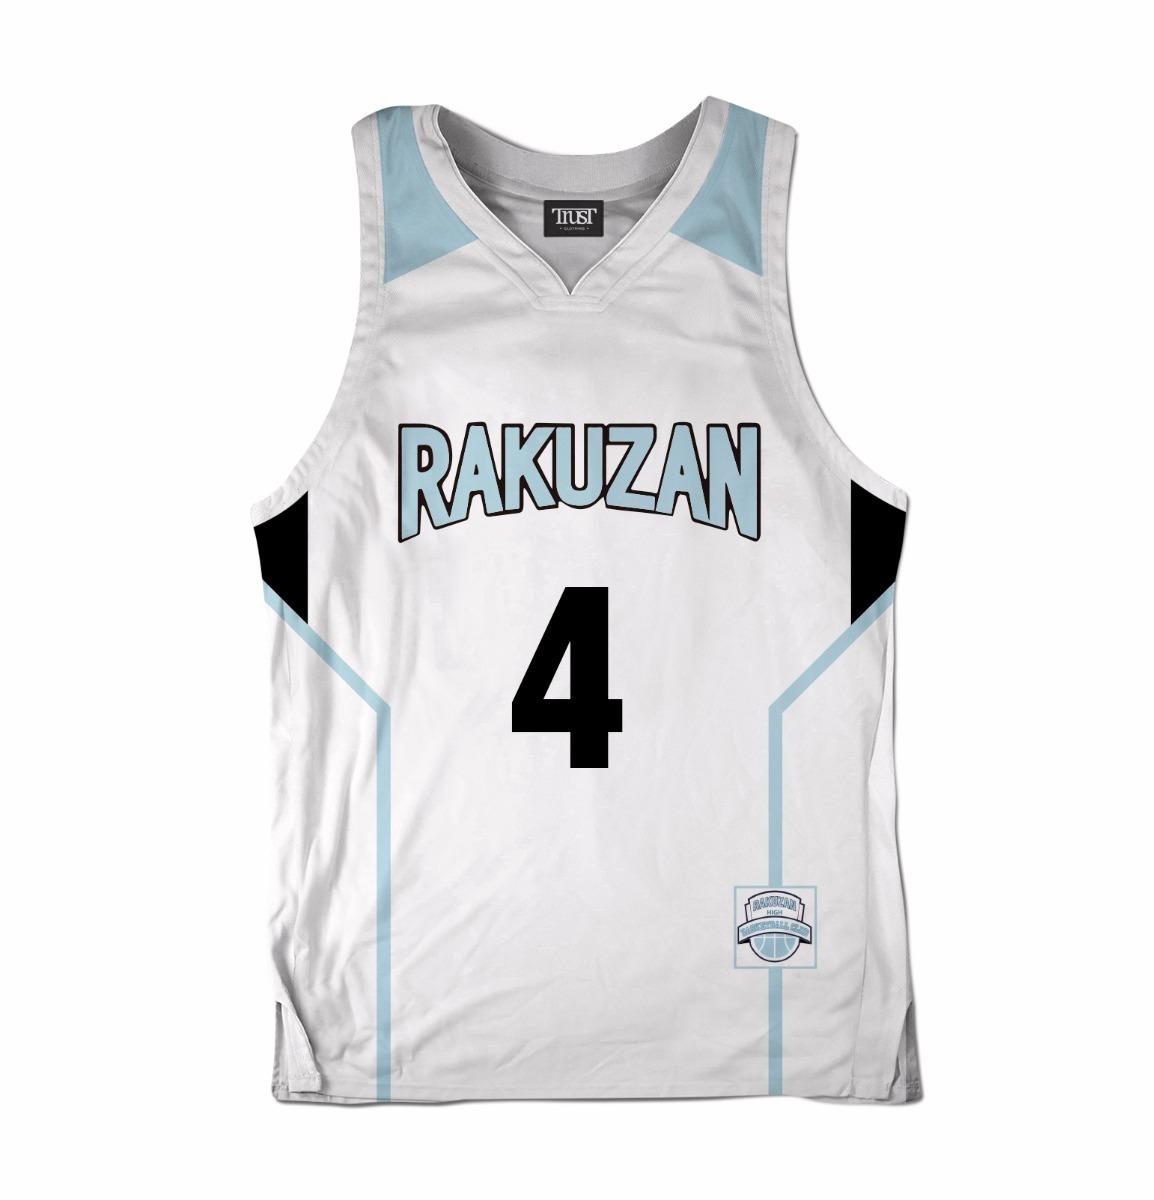 4d853d8c8 camiseta regata kuroko no basket anime rakuzan hype shounen. Carregando zoom .